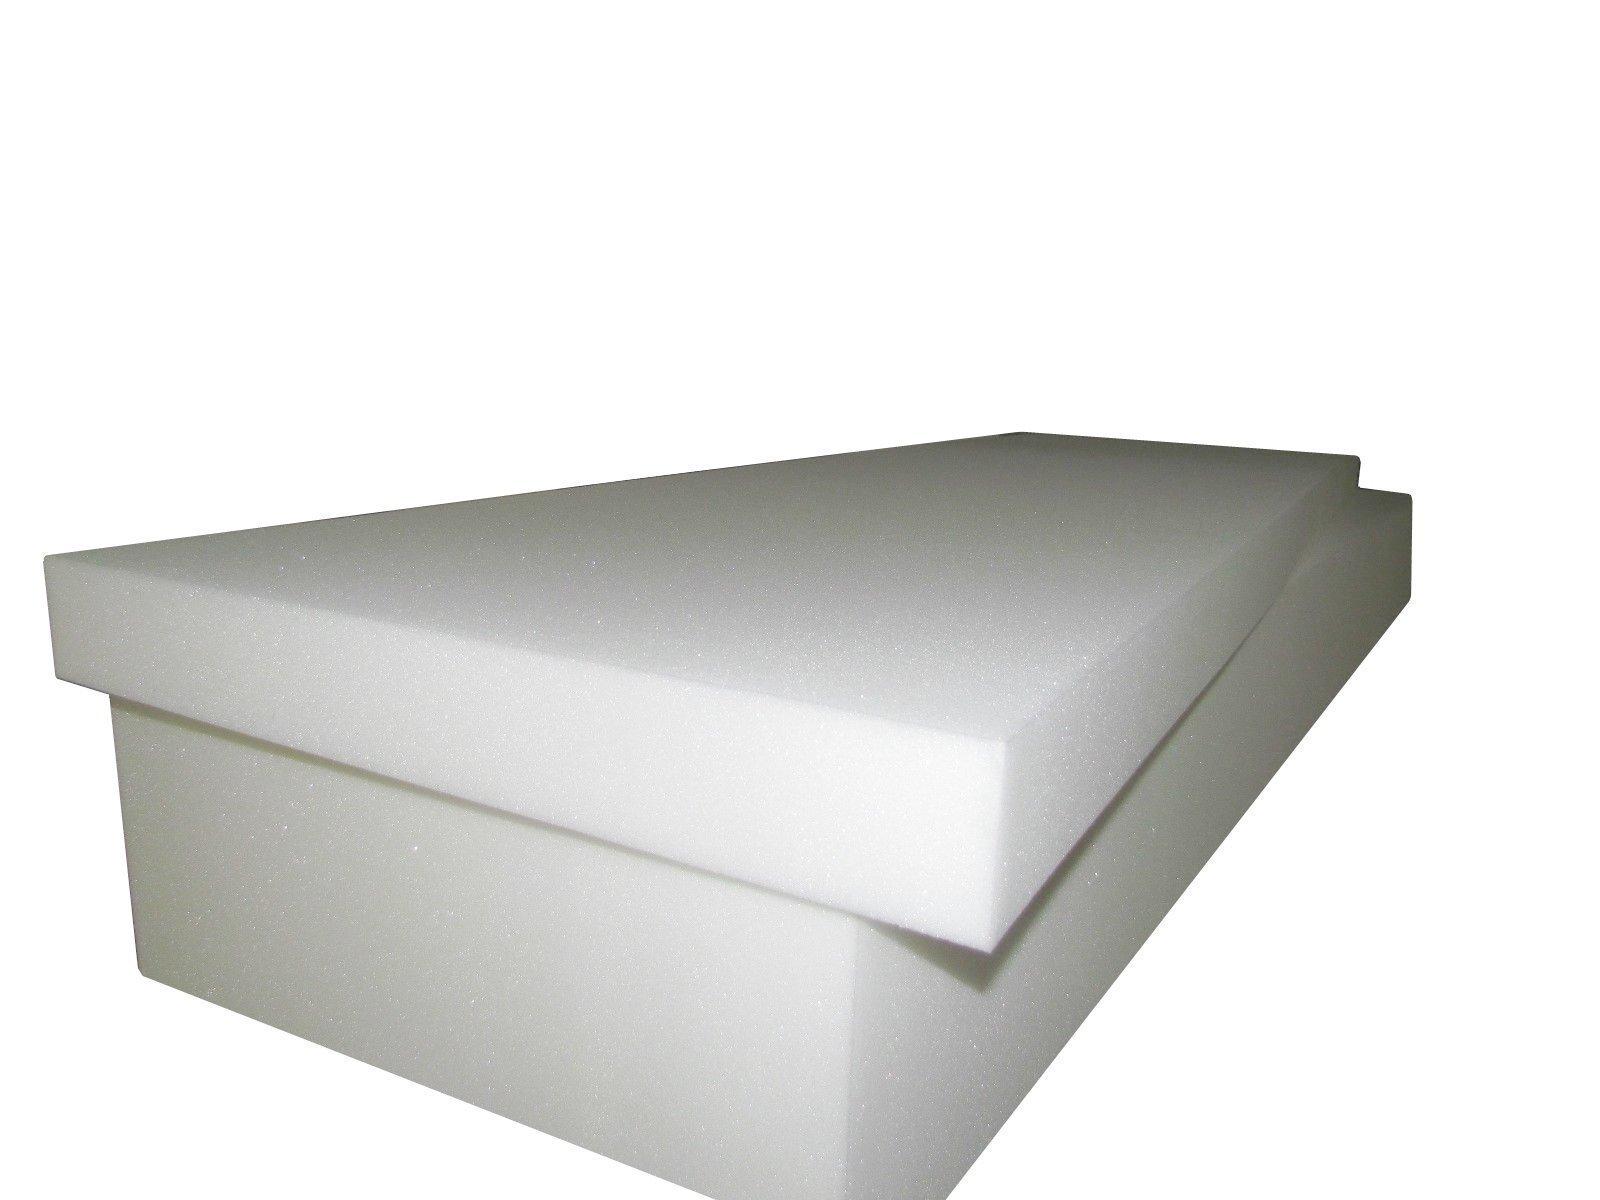 Foam Mattress - Single/Twin Size 7''x 39''x 75'' (Sofa Cushion Replacement Foam, RV Campers, Boats Caravans Mattress & more) '' Medium Firm (1536)